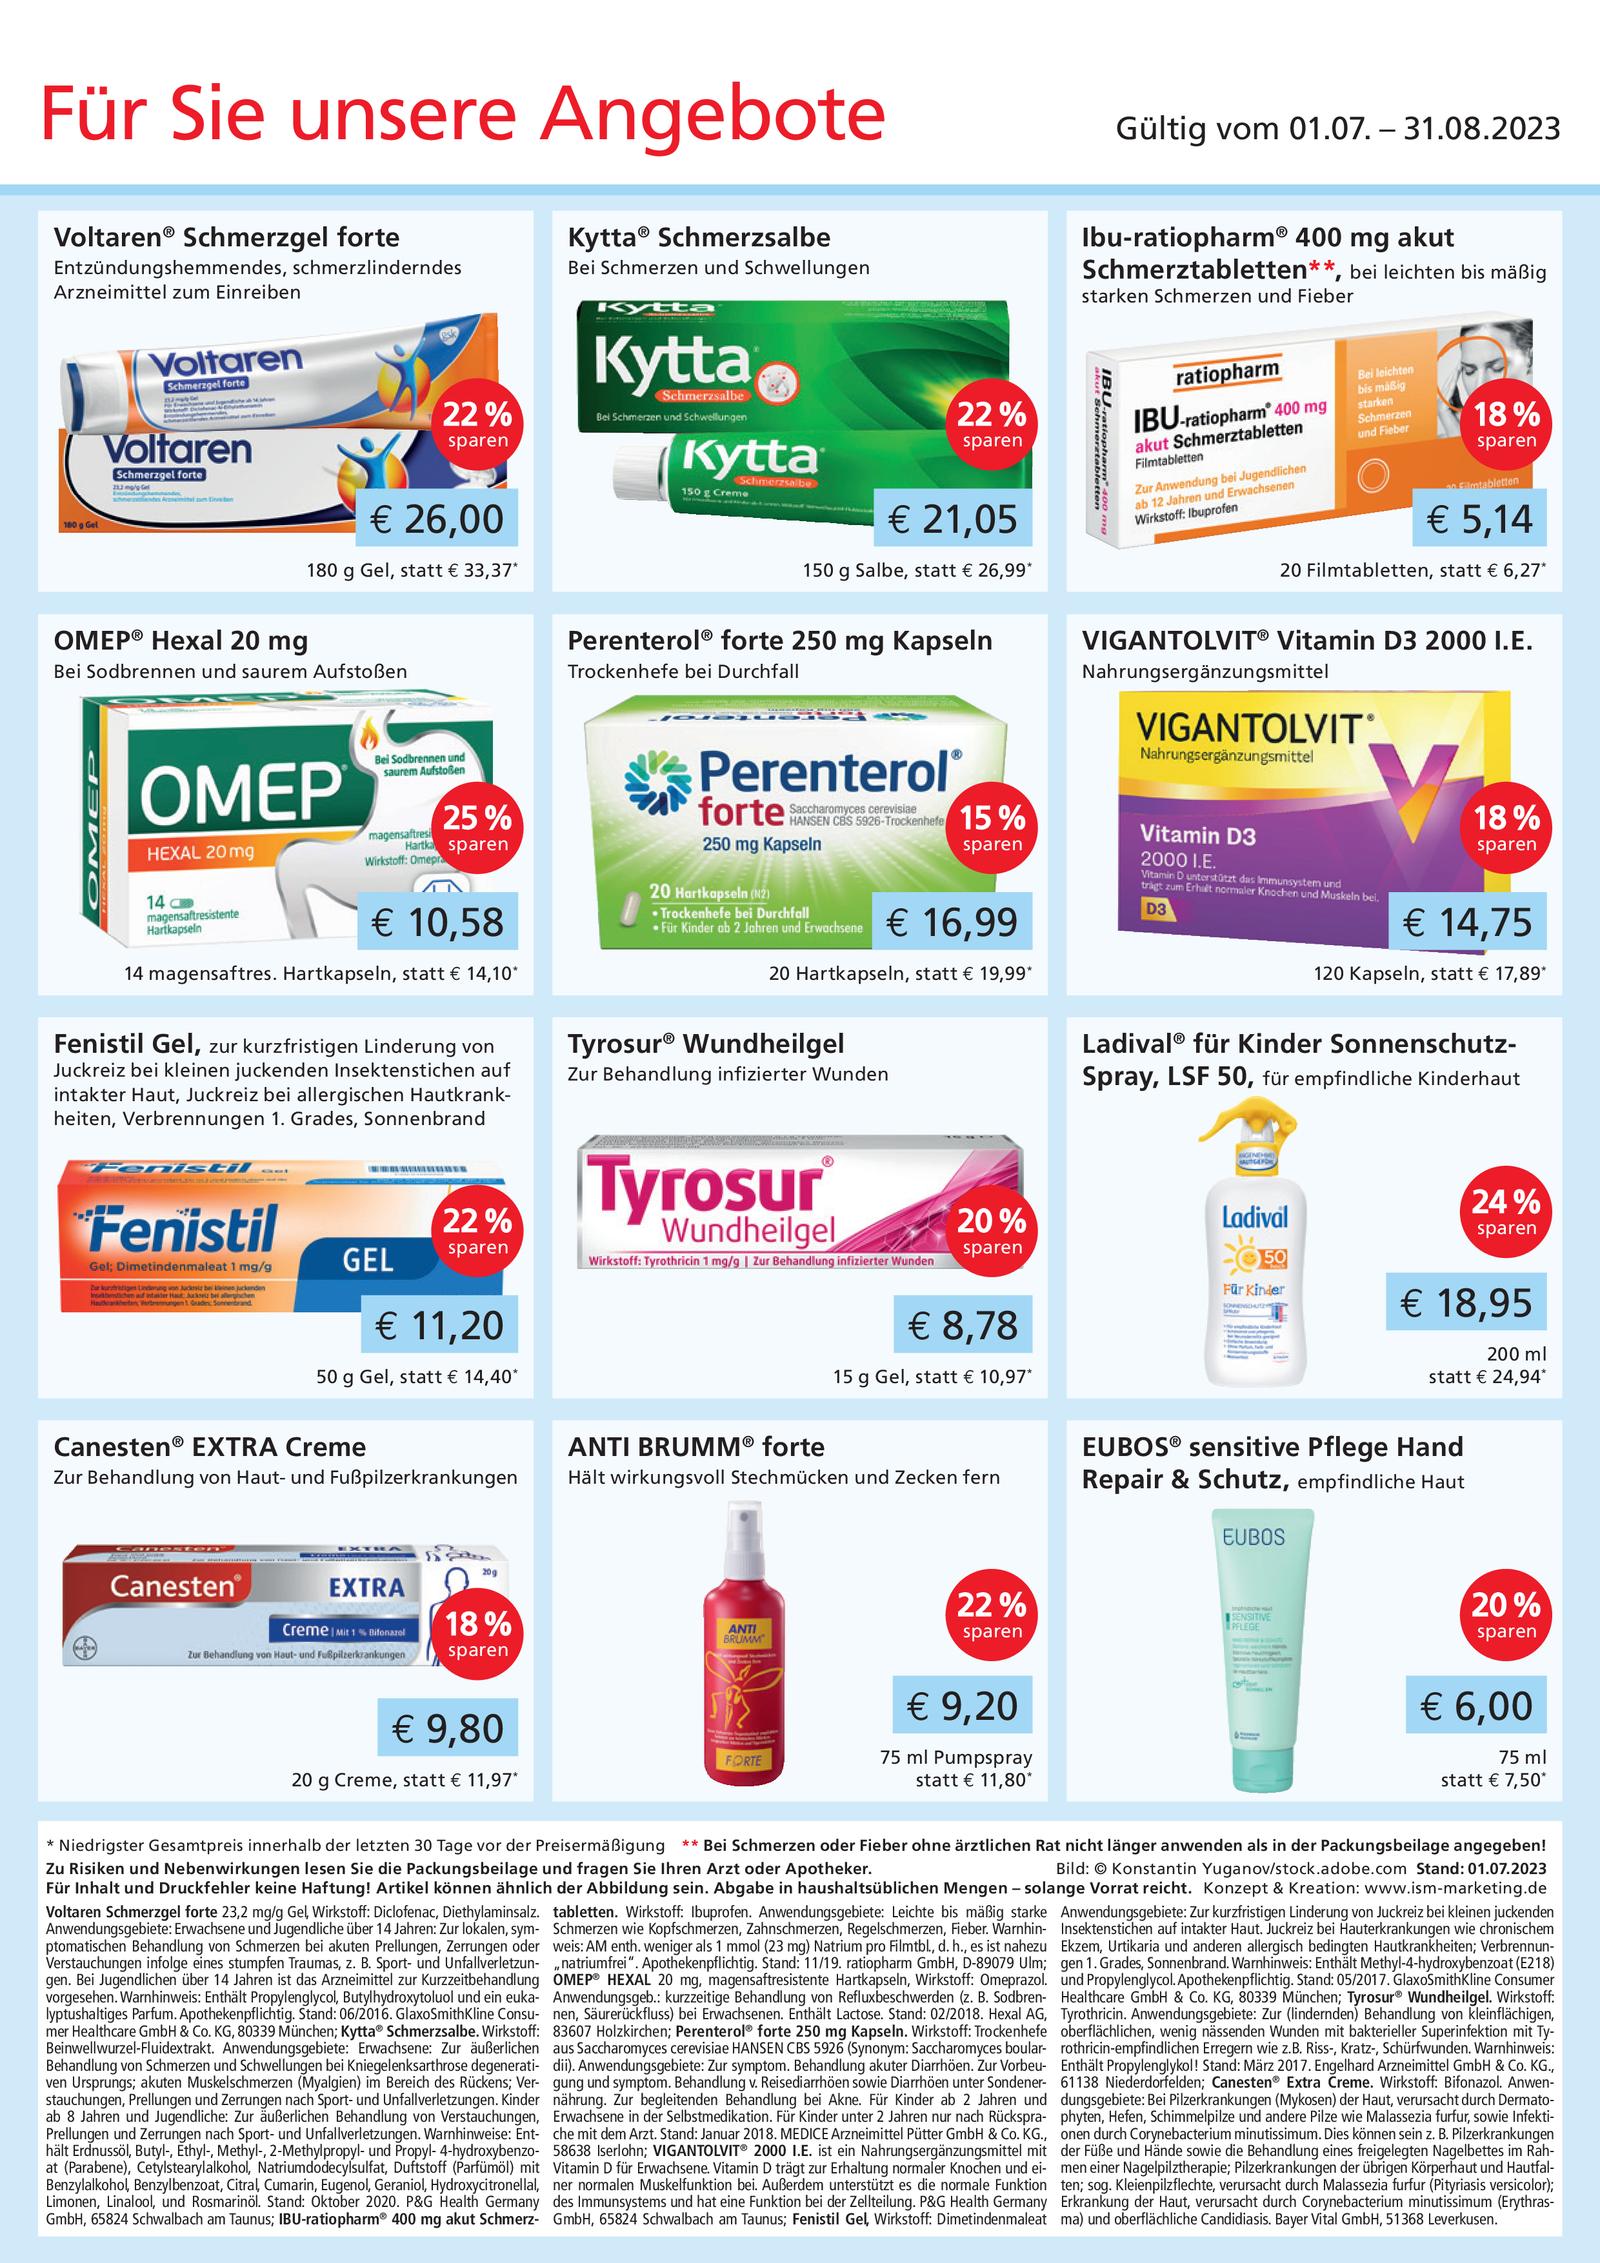 https://mein-uploads.apocdn.net/8807/leaflets/8807_flyer-Seite2.png